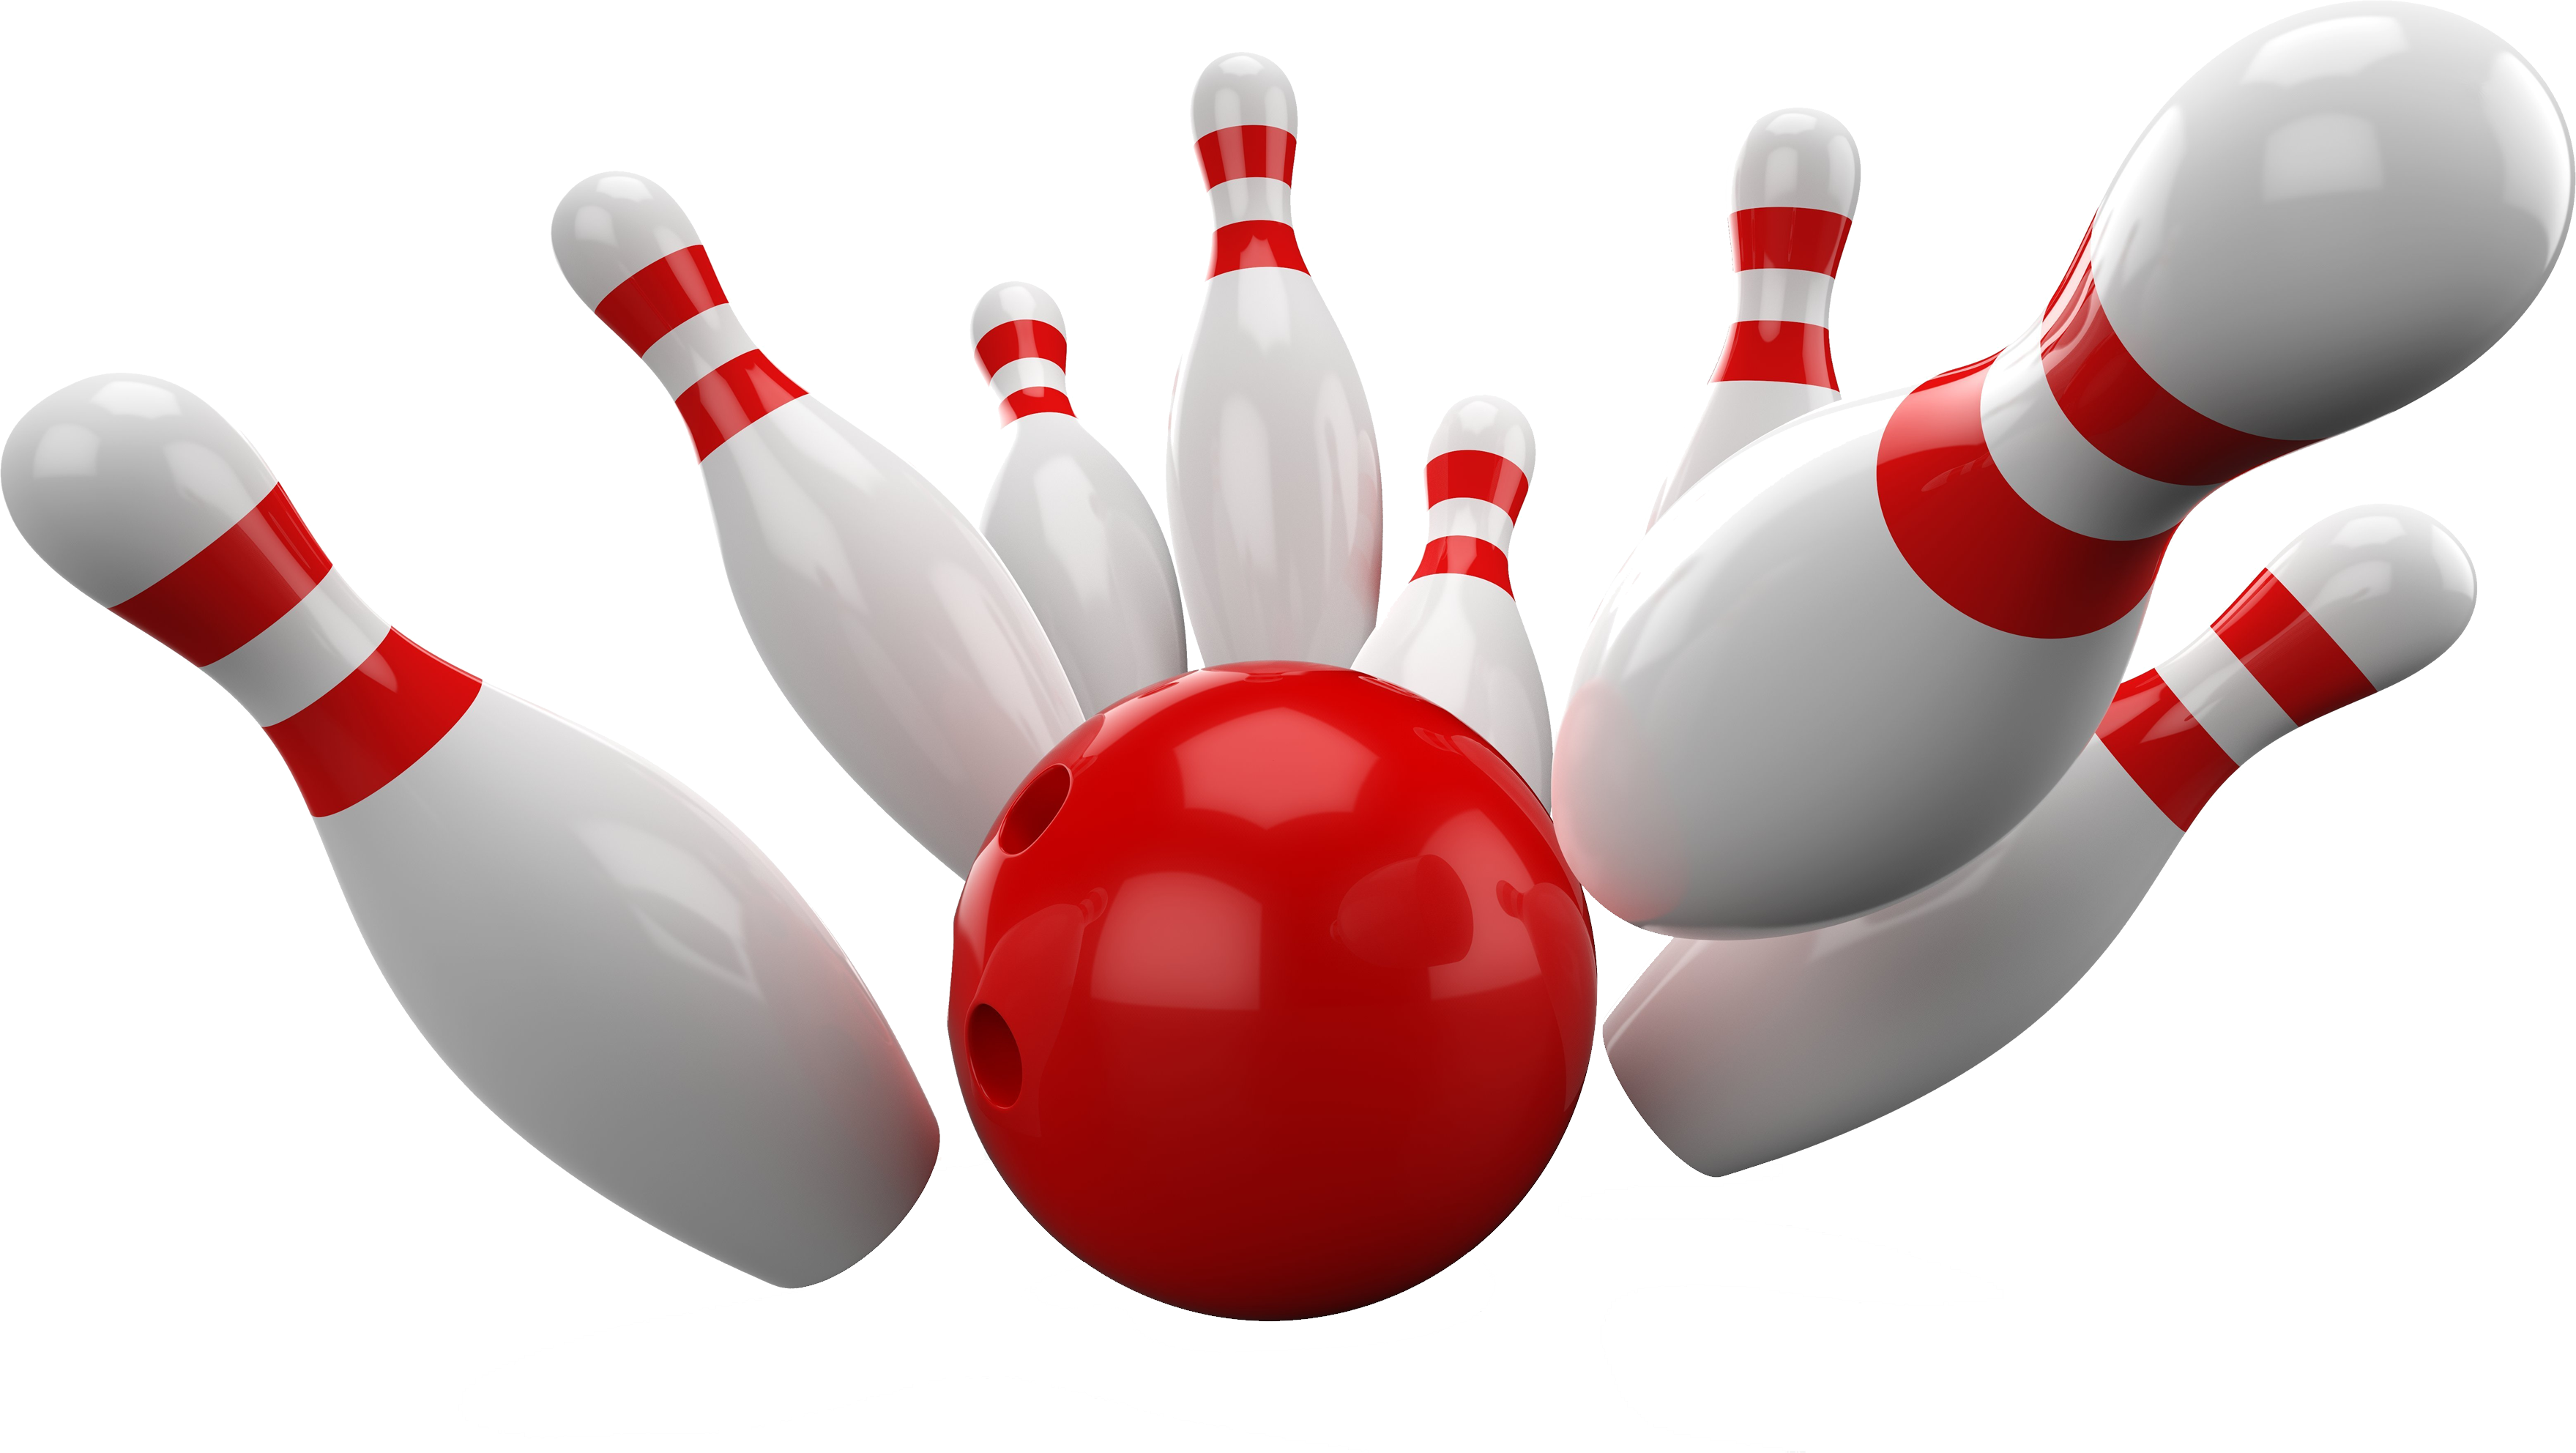 Bowling ball Strike Bowling p